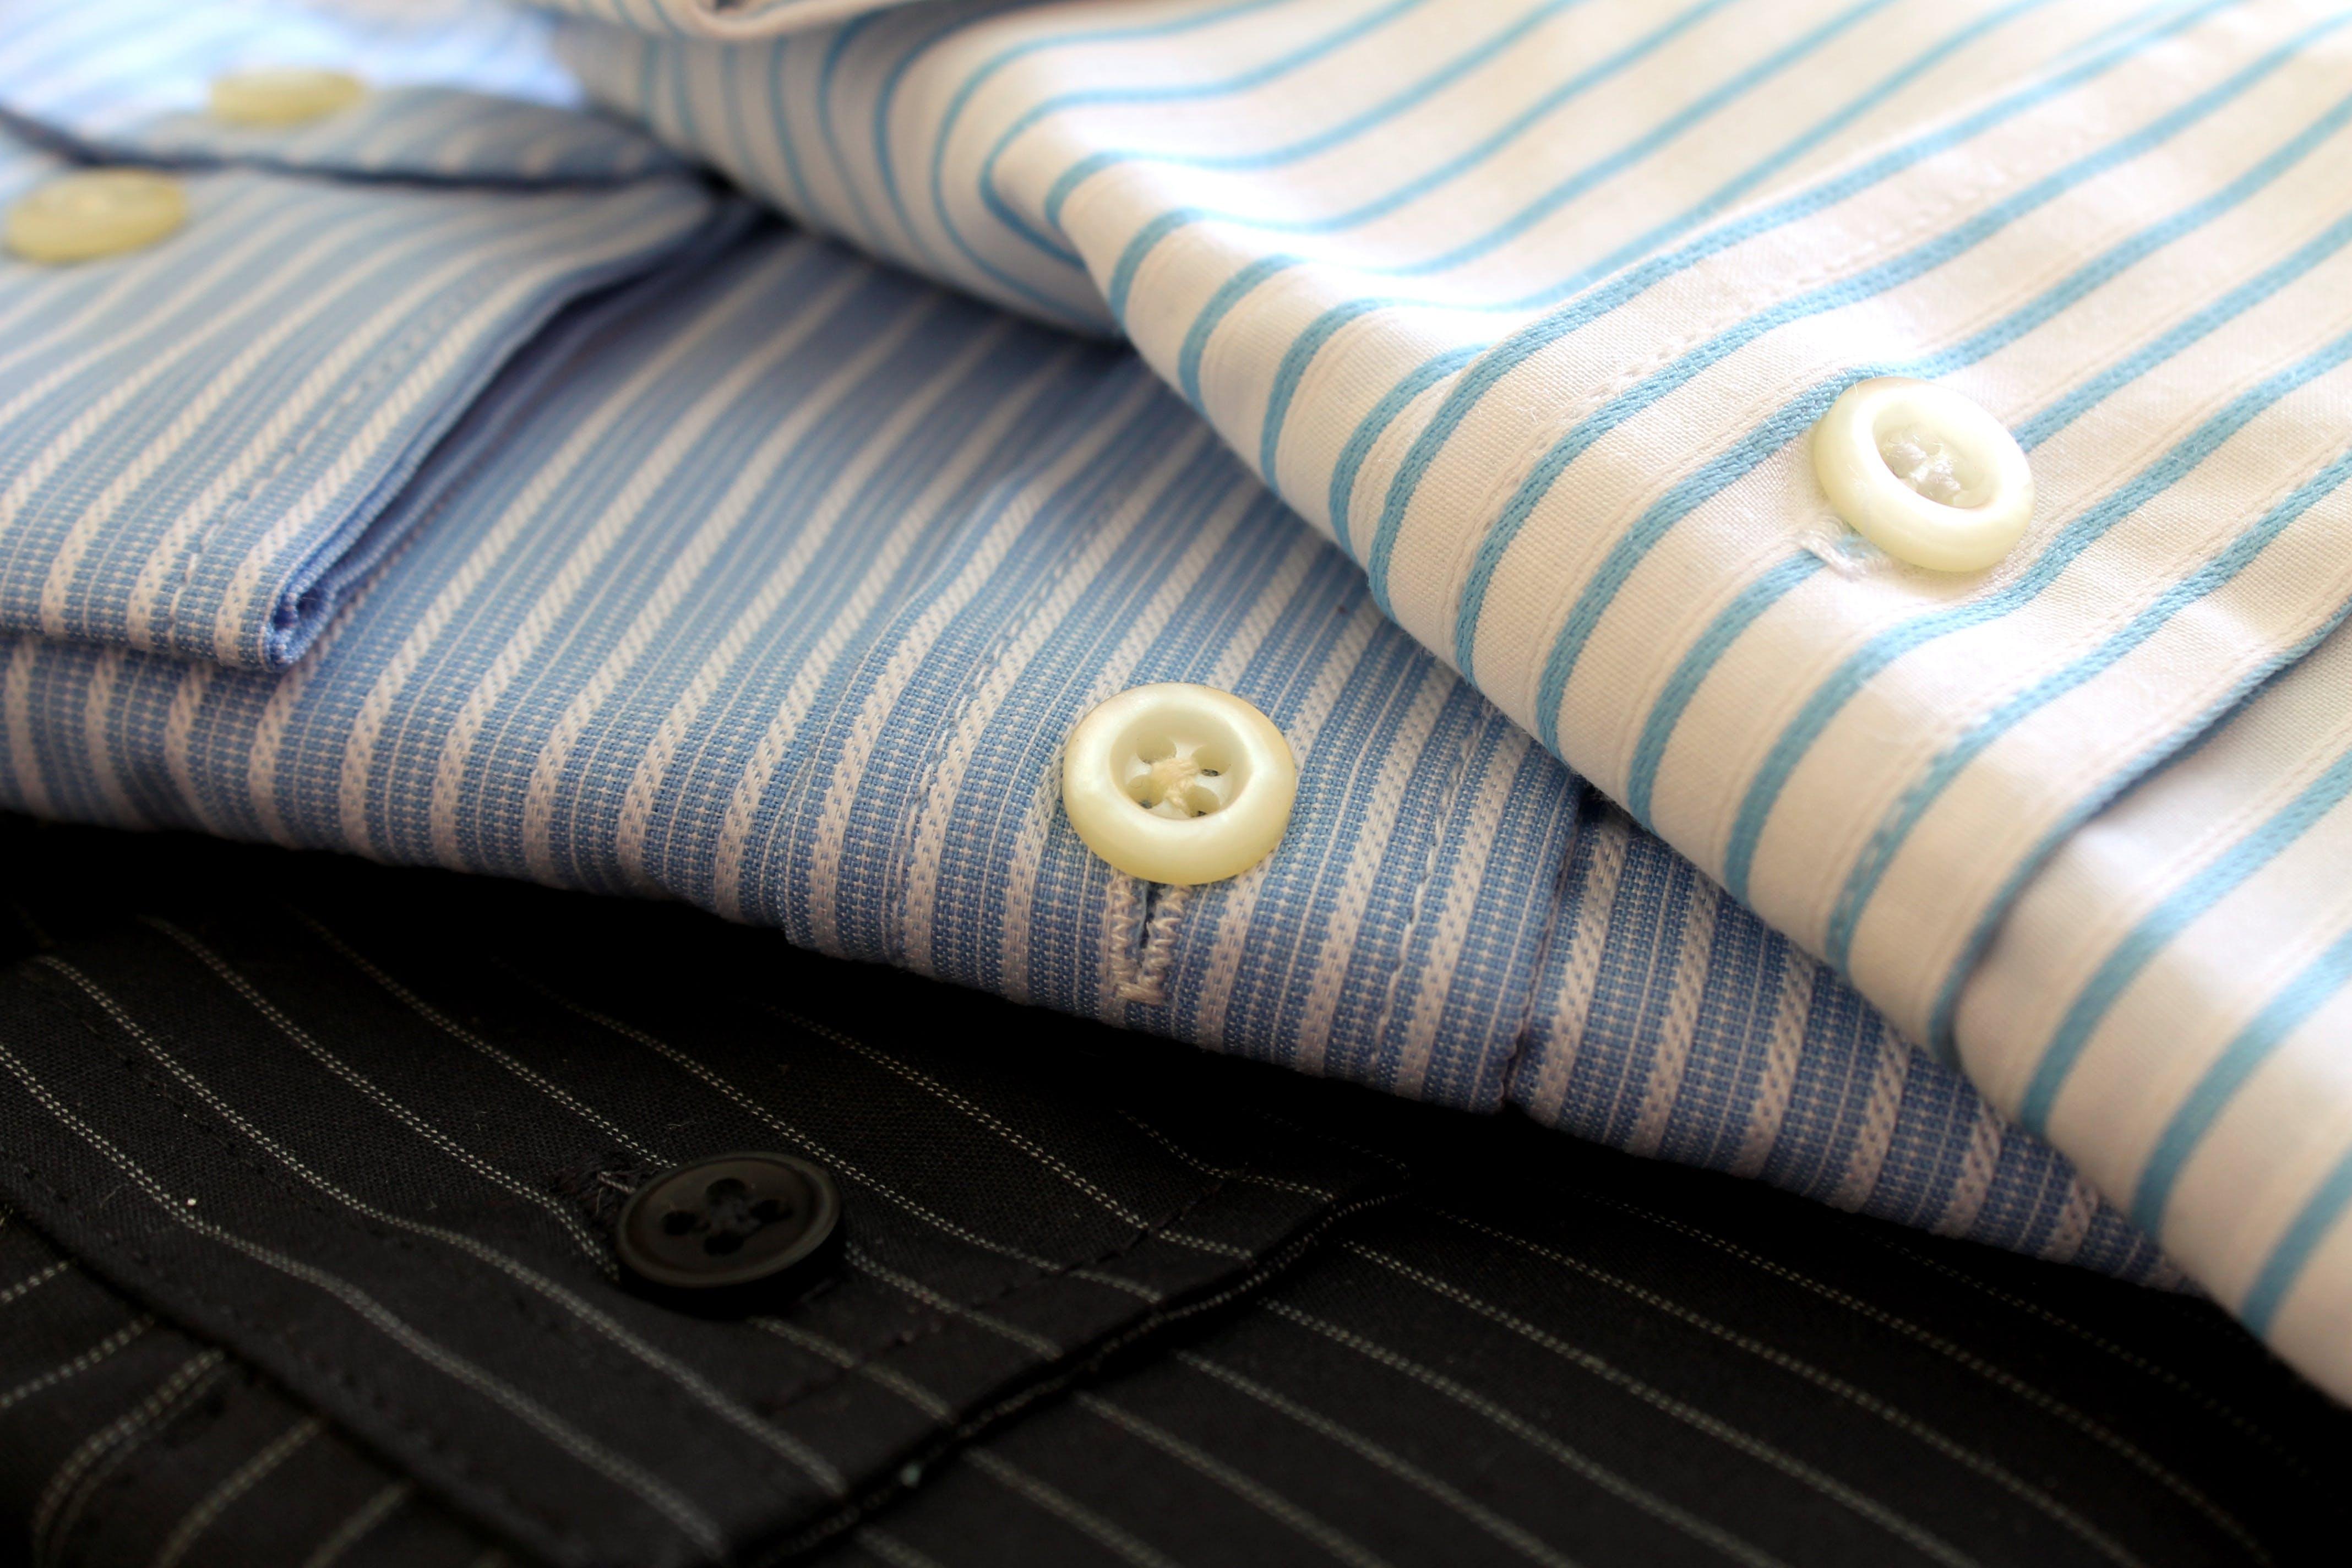 Free stock photo of clothing, shirts, men's clothing, social shirts